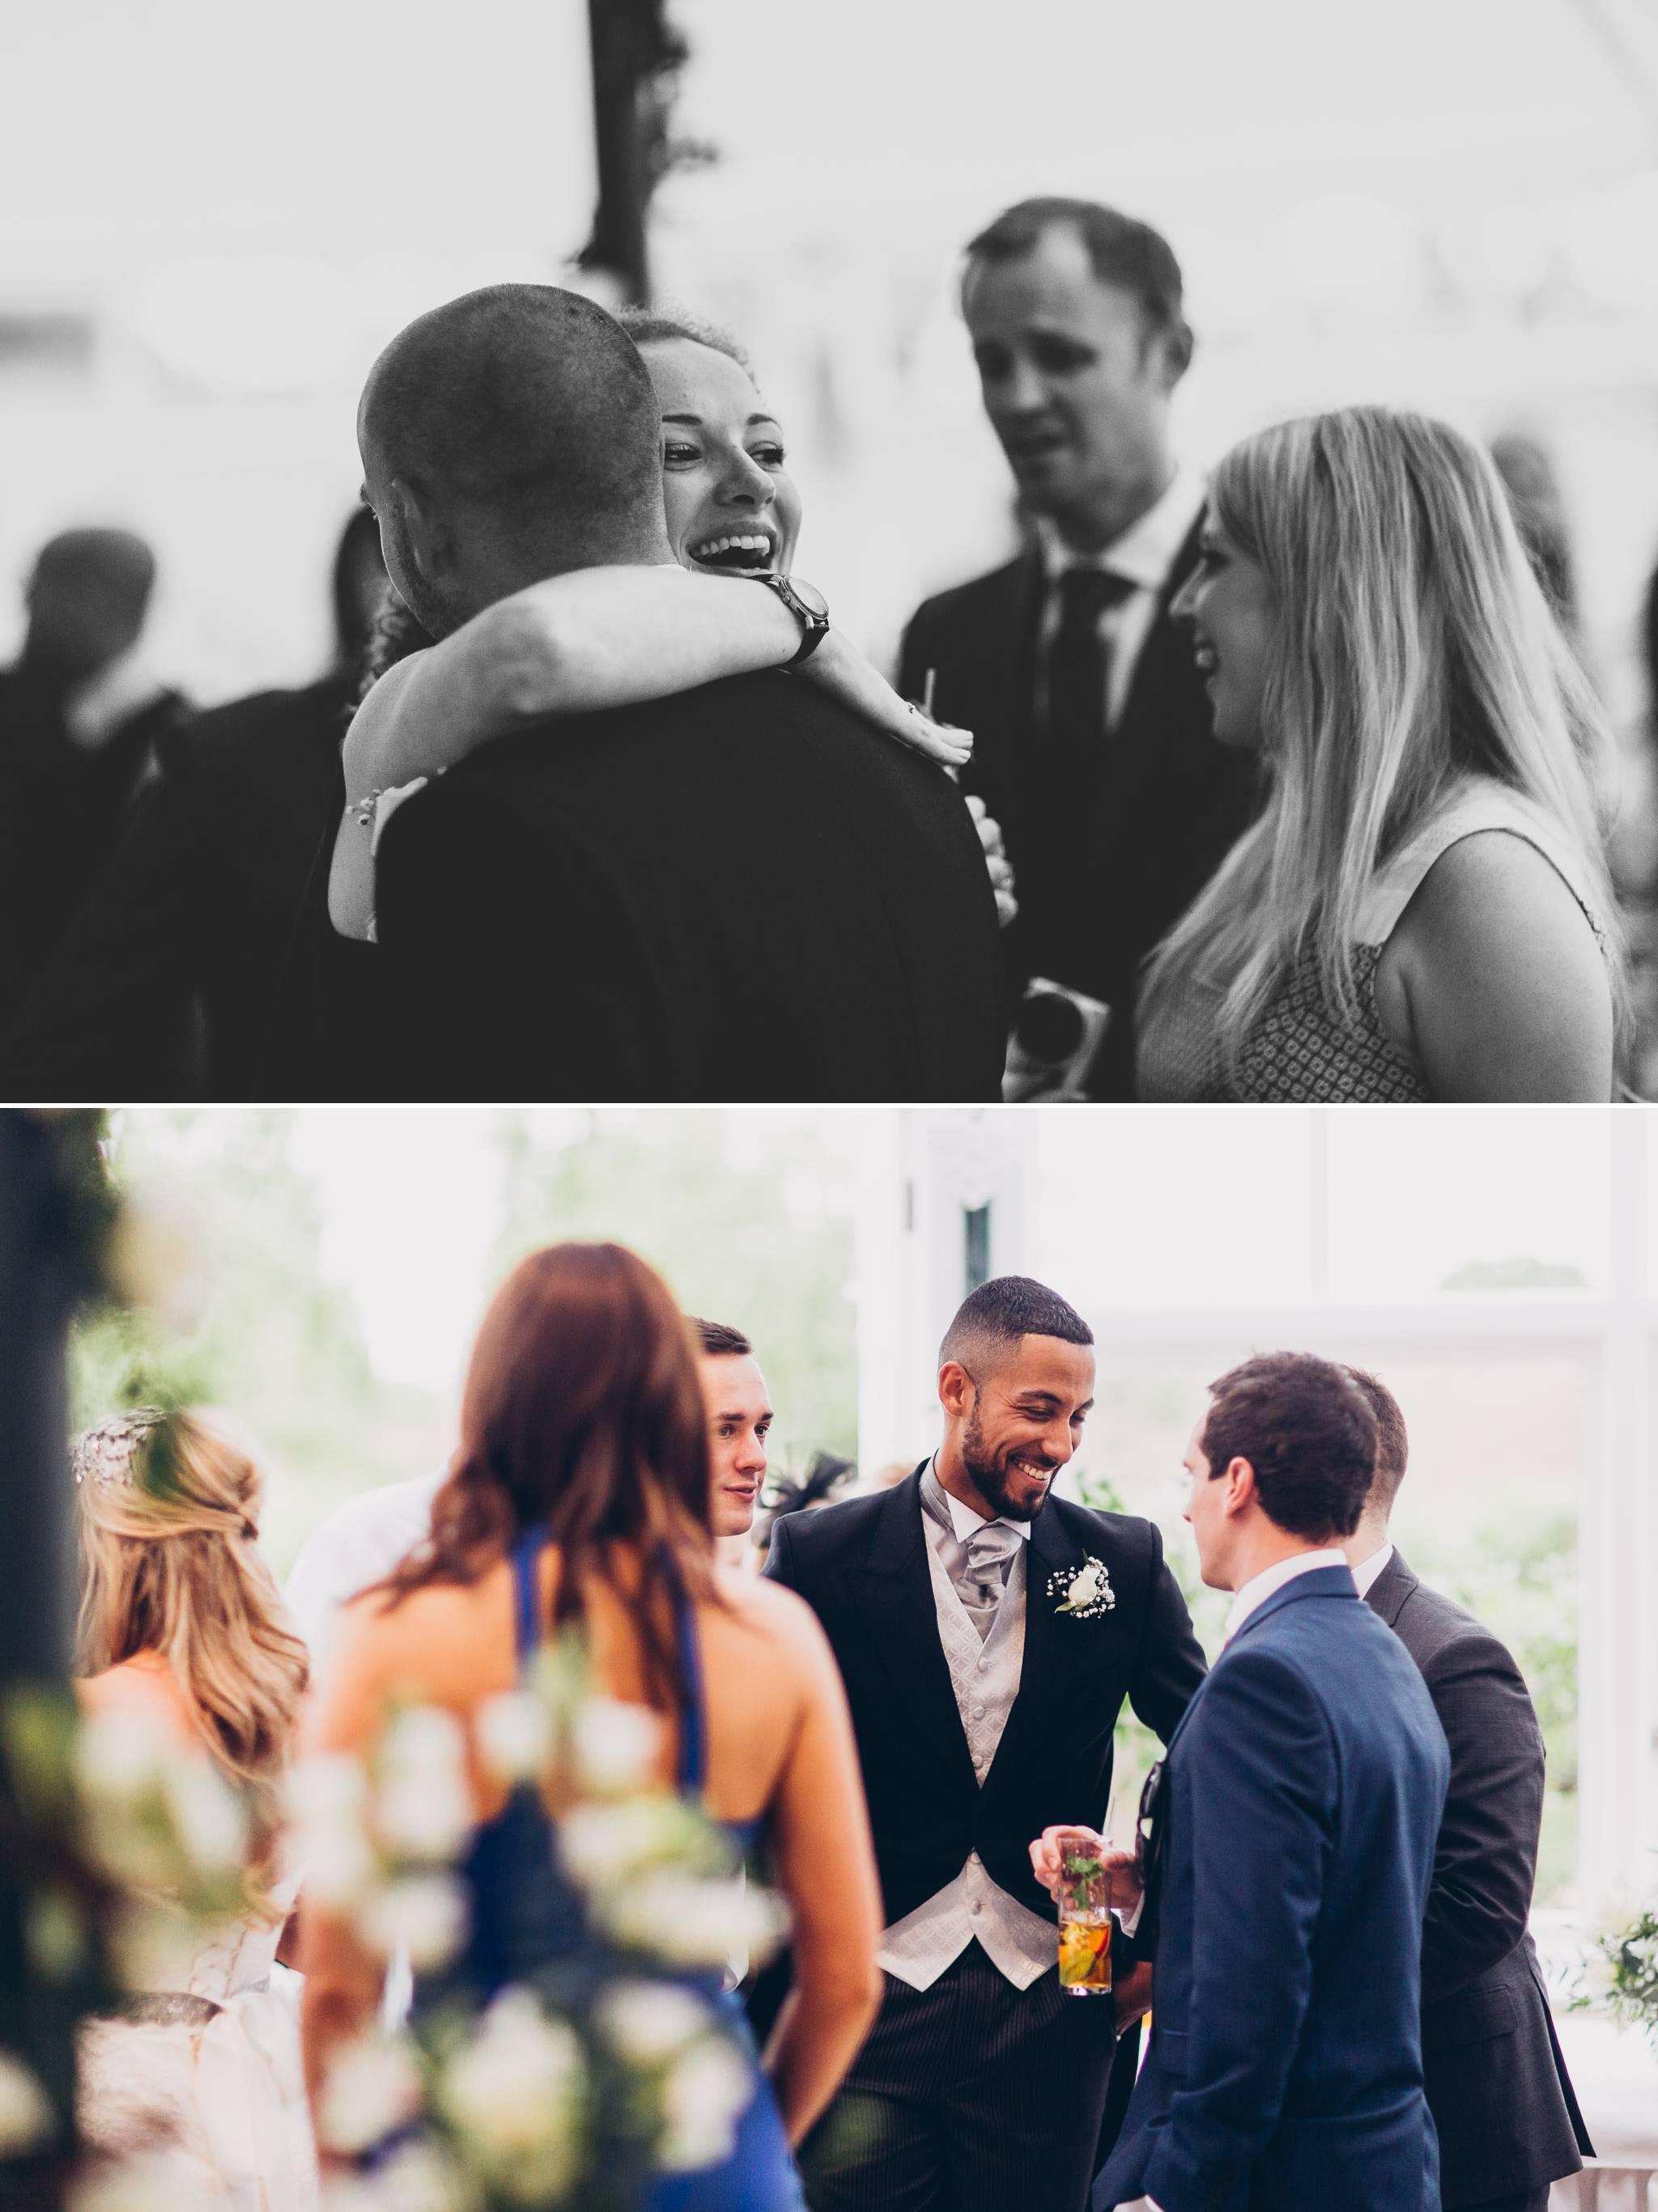 shropshire-wedding-photography 16.jpg